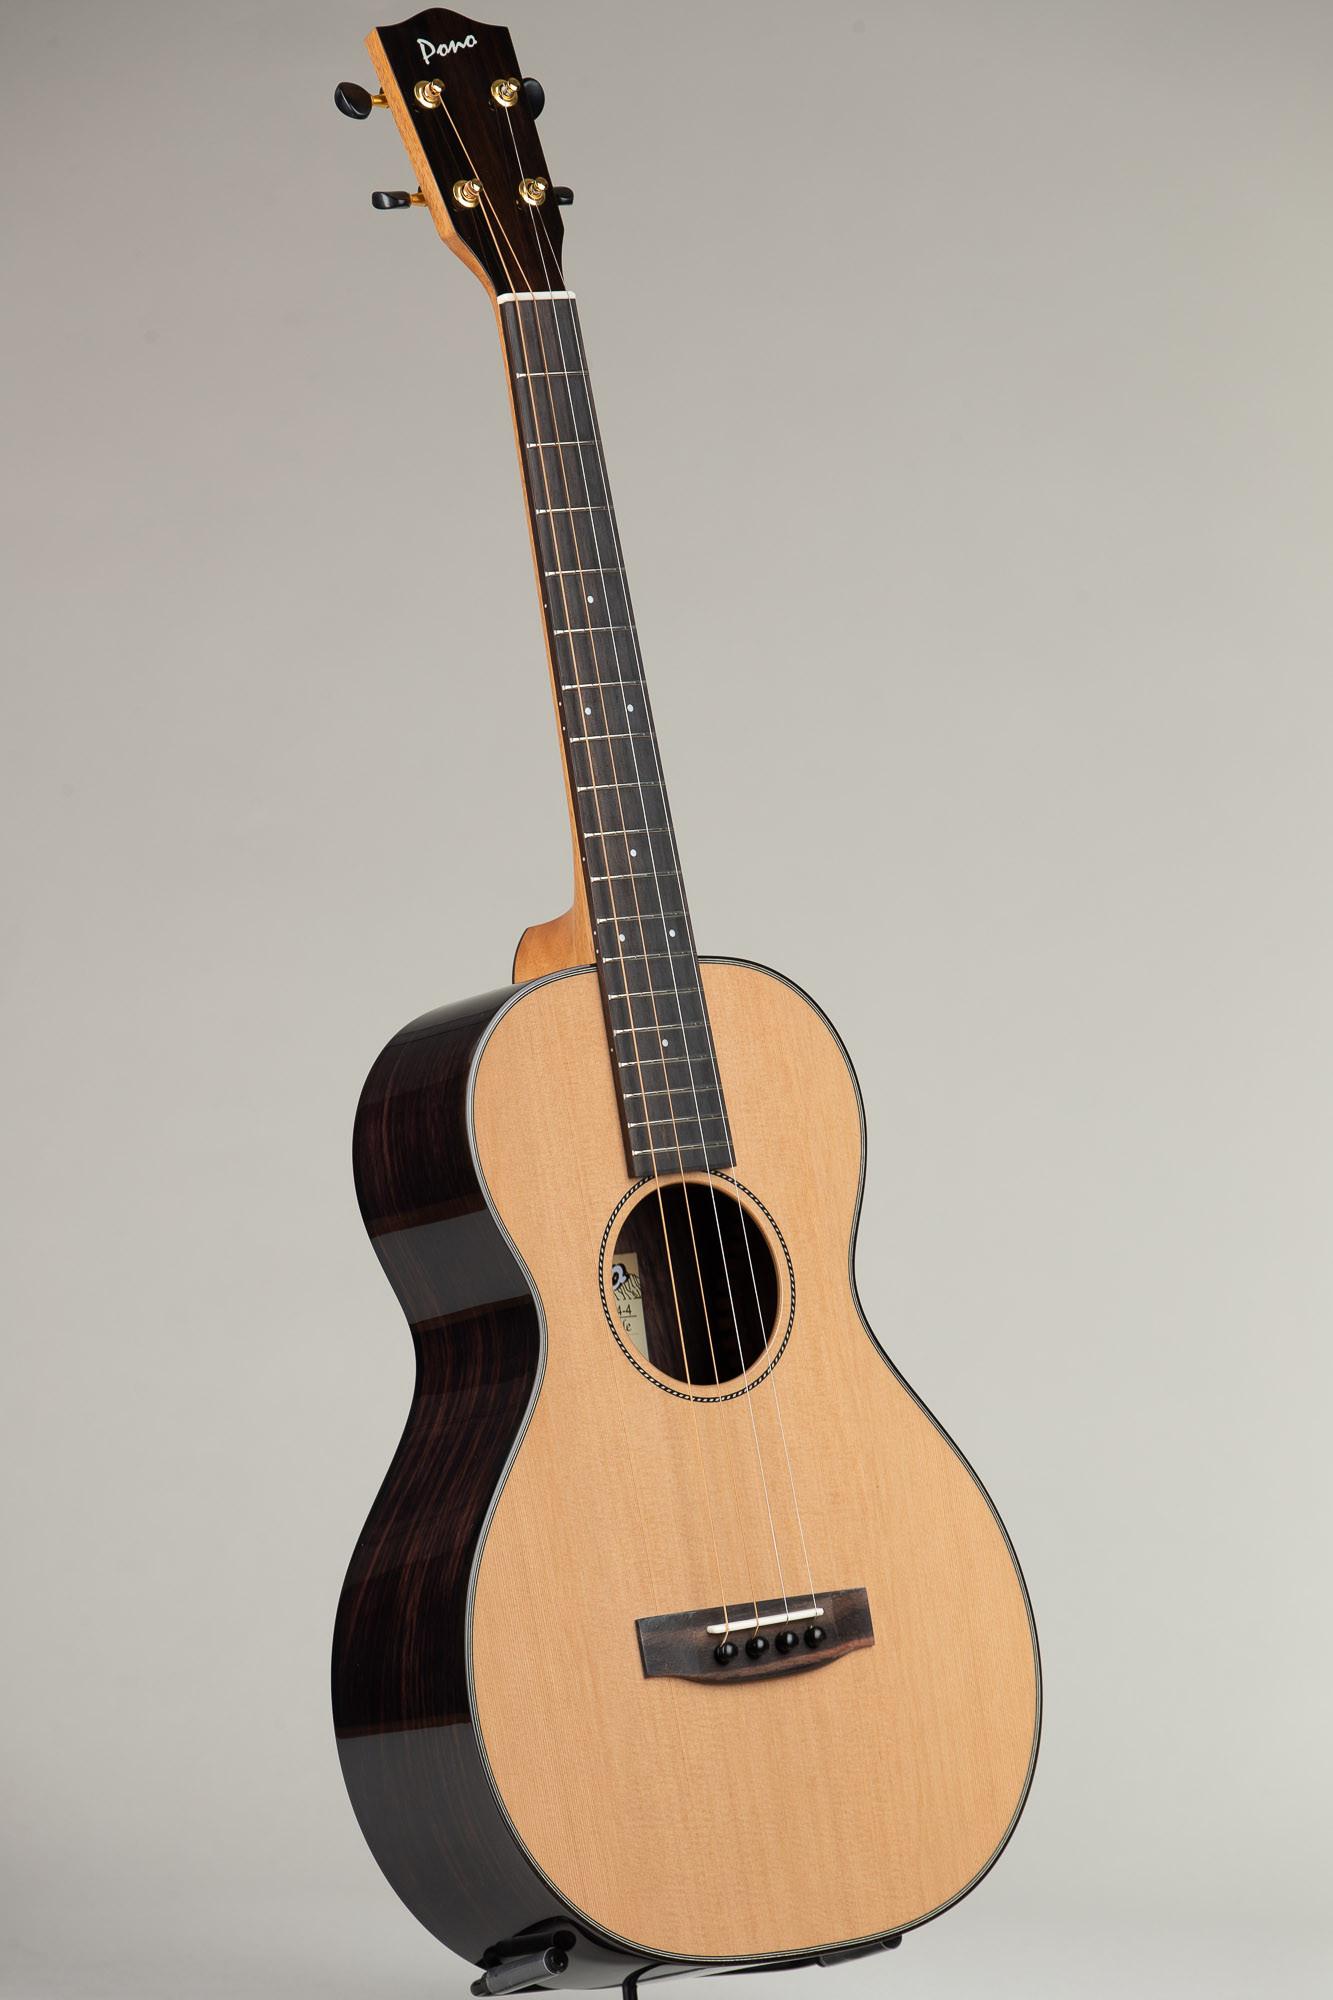 Pono Cedar Rosewood Steel String Baritone (UL4-4 3035)